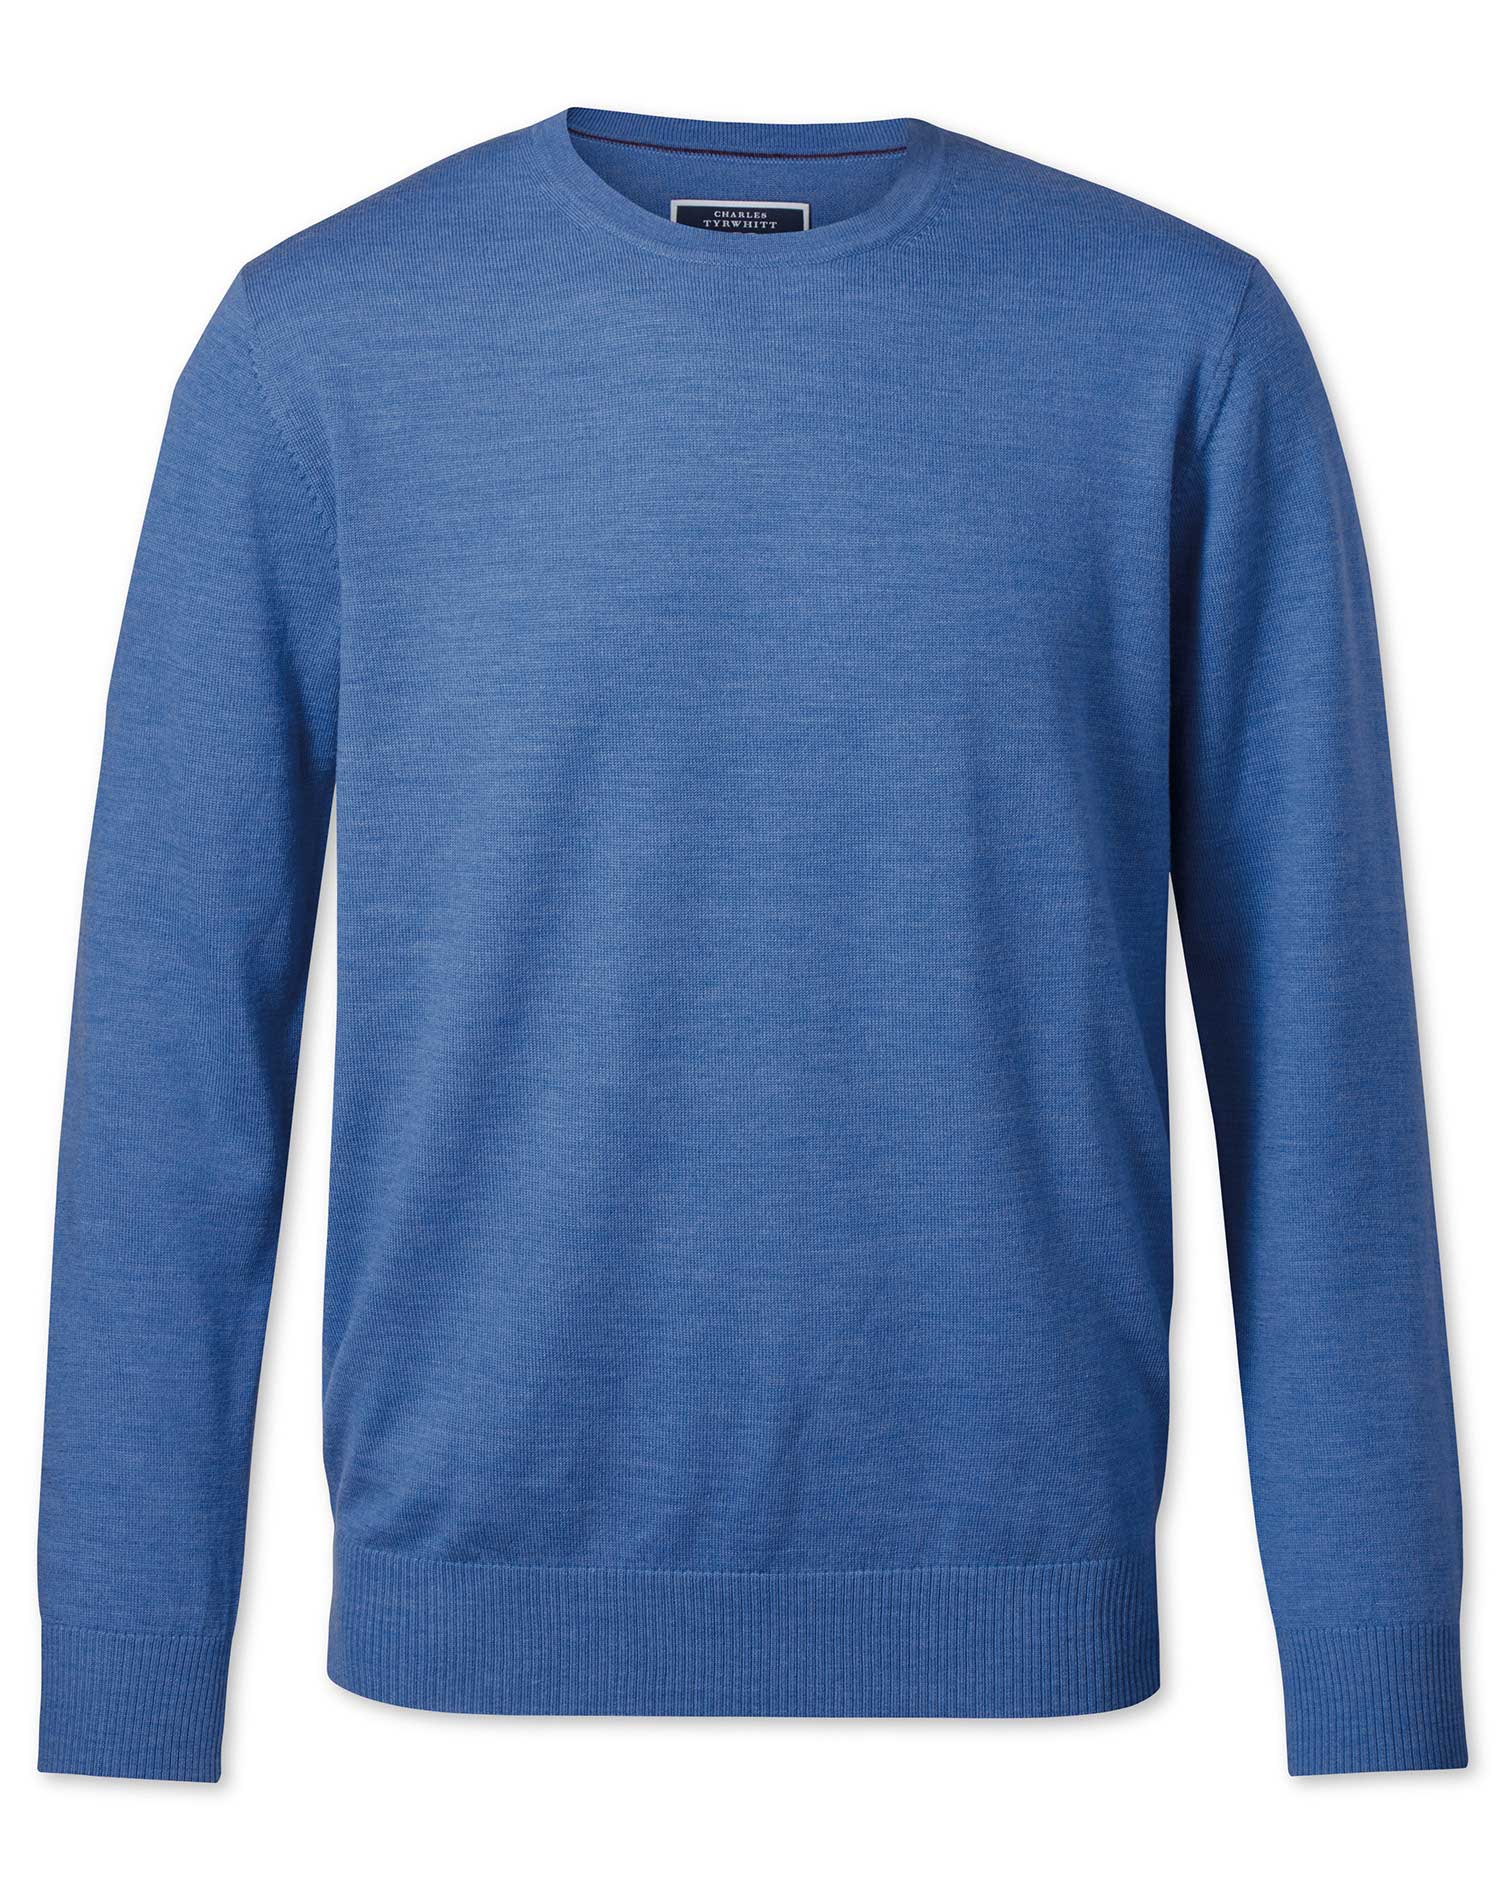 Blue Merino Wool Crew Neck Jumper Size XS by Charles Tyrwhitt